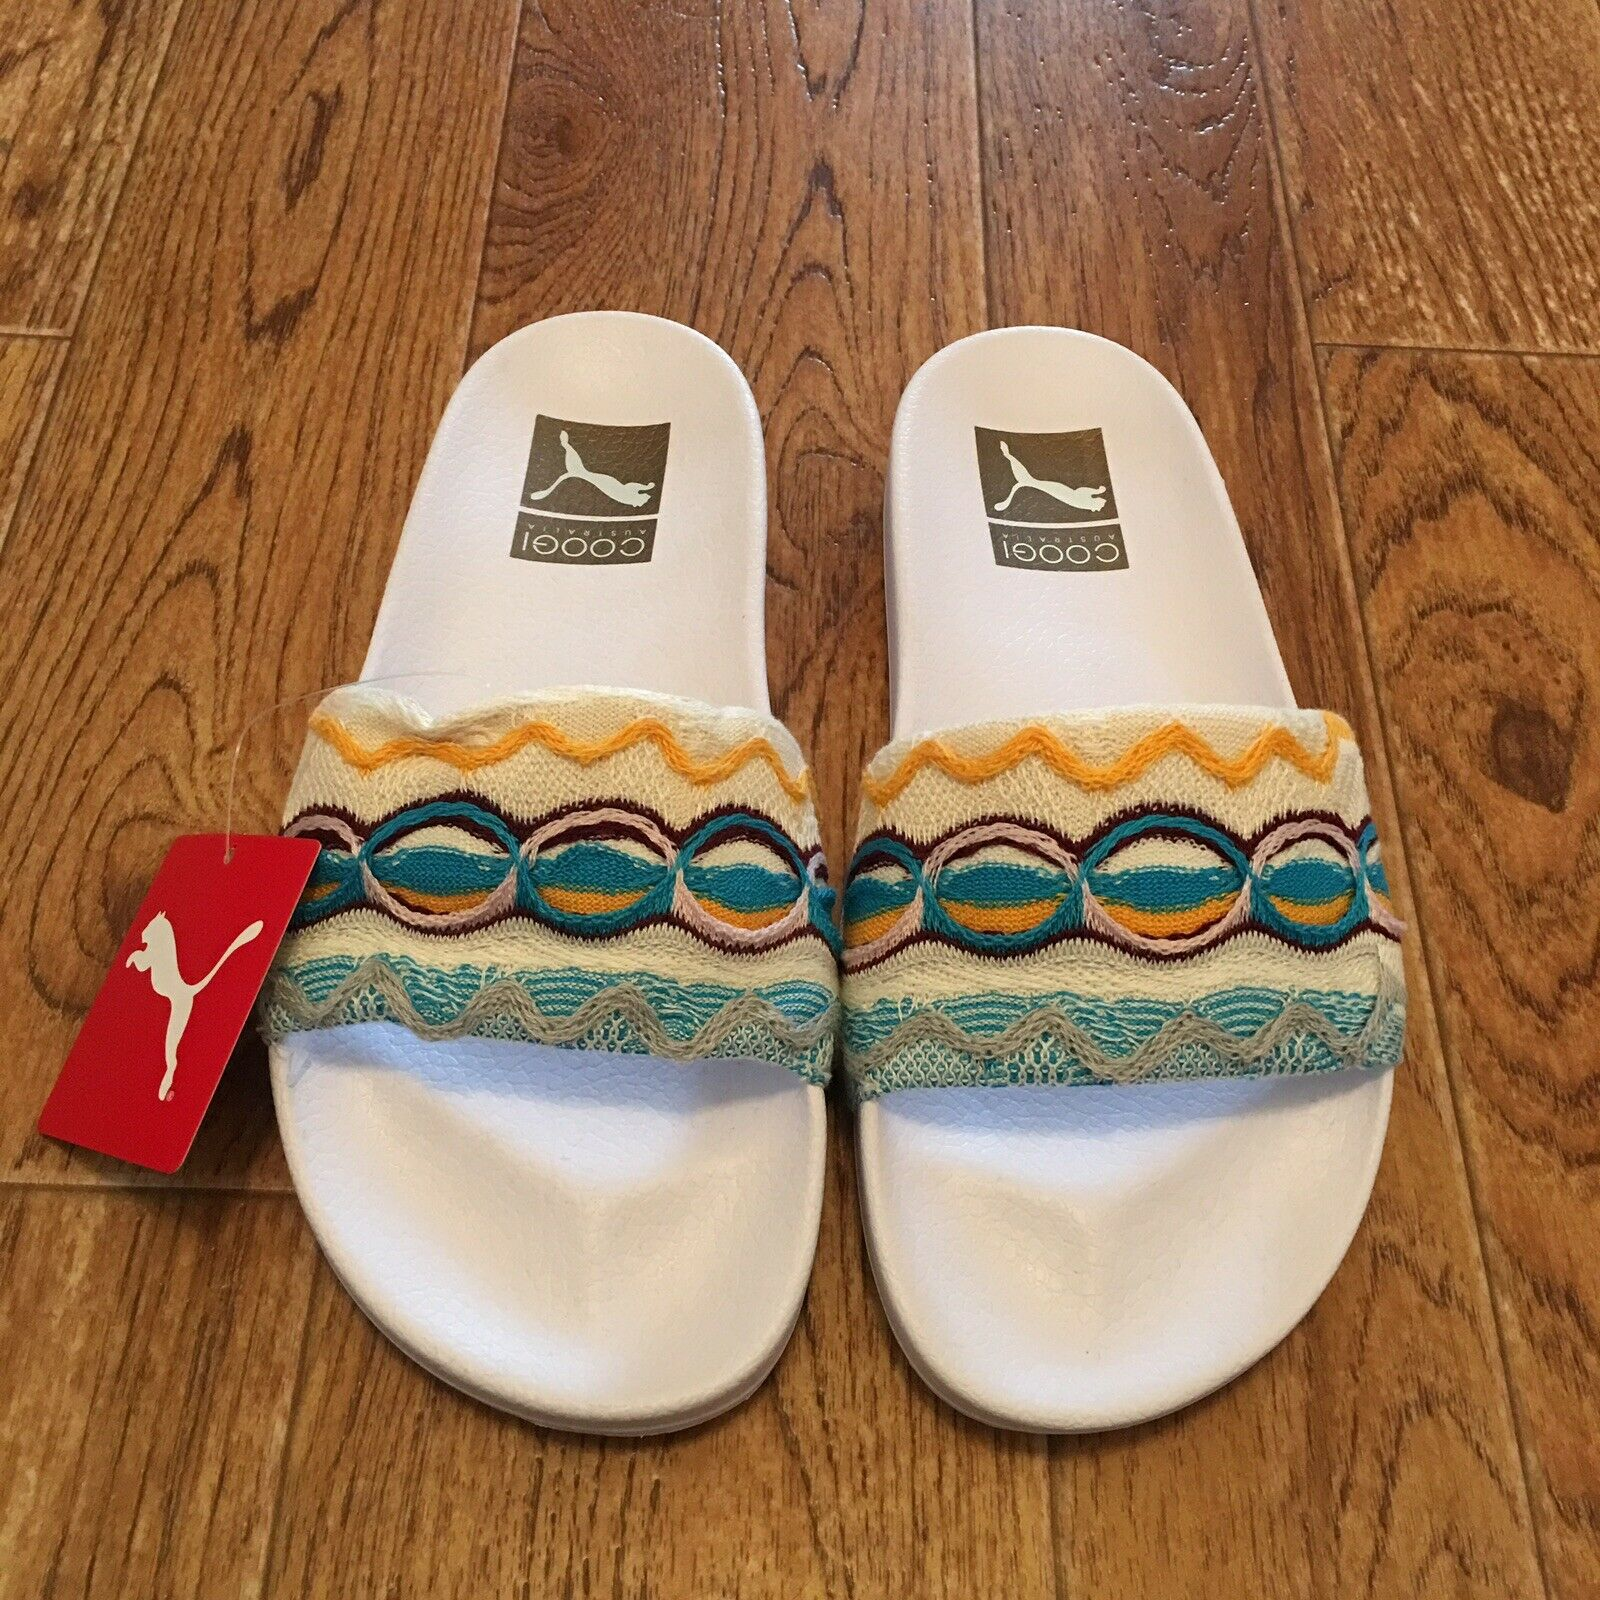 55b26a5425 Puma x Coogi Leadcat Slides Multi White Knit Sandals Sandals Sandals ...